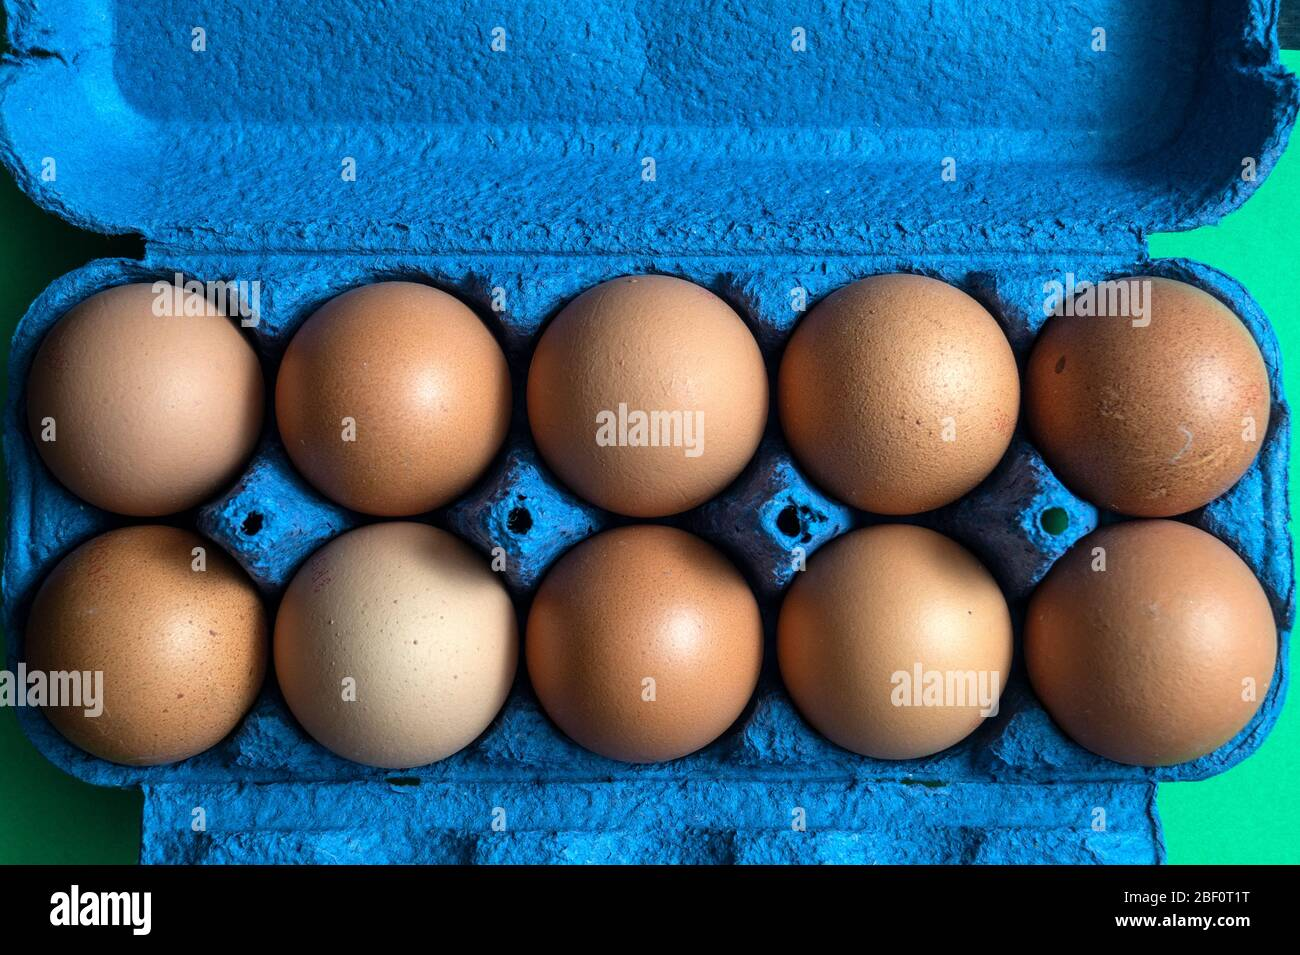 Huevos de pollo marrón orgánico en cartón sobre fondos rústicos de madera de mesa, conceptos naturales de alimentos saludables Foto de stock